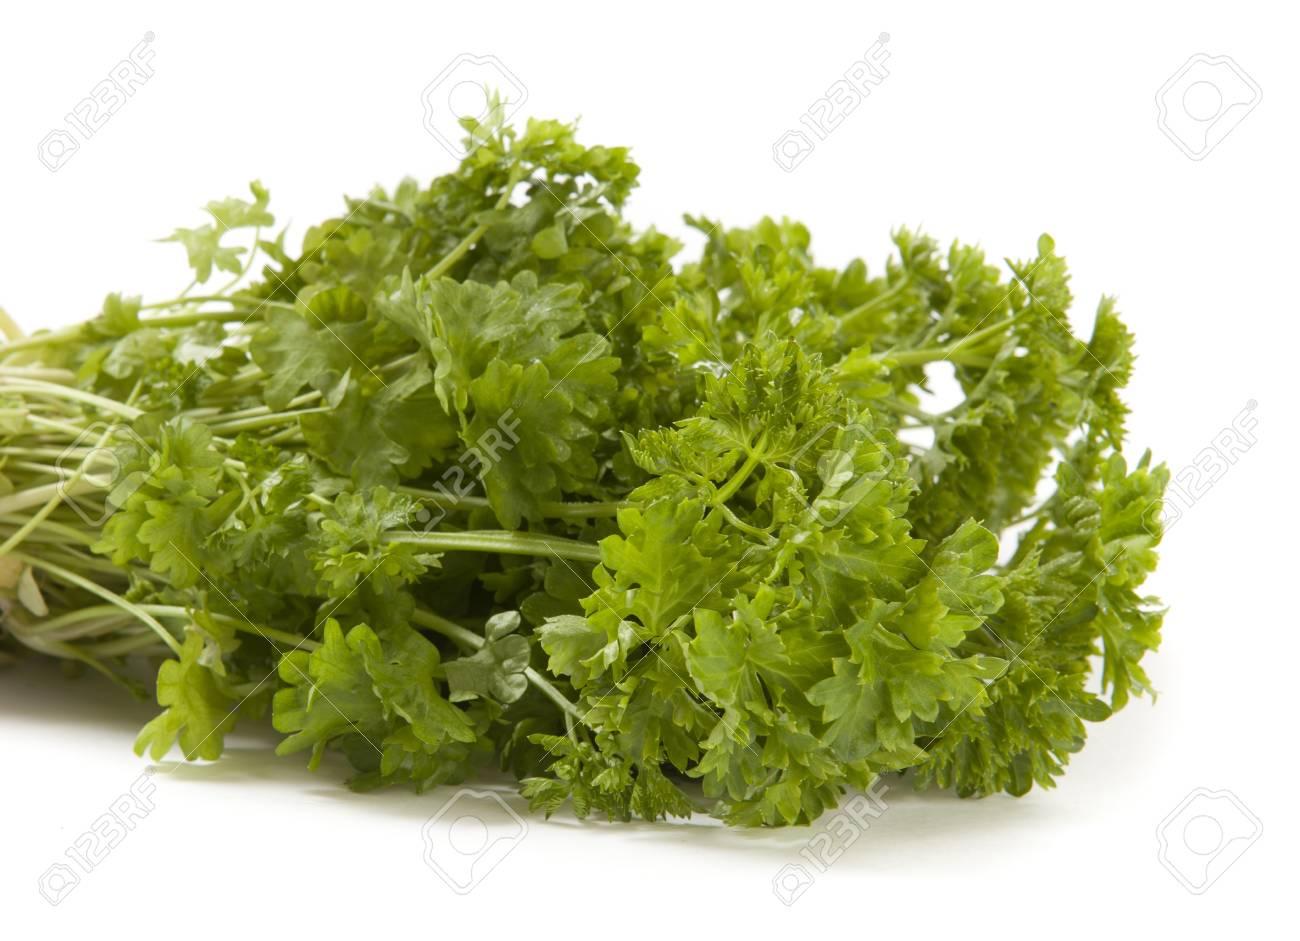 Fresh Green Parsley Isolated on White Background Stock Photo - 11264824